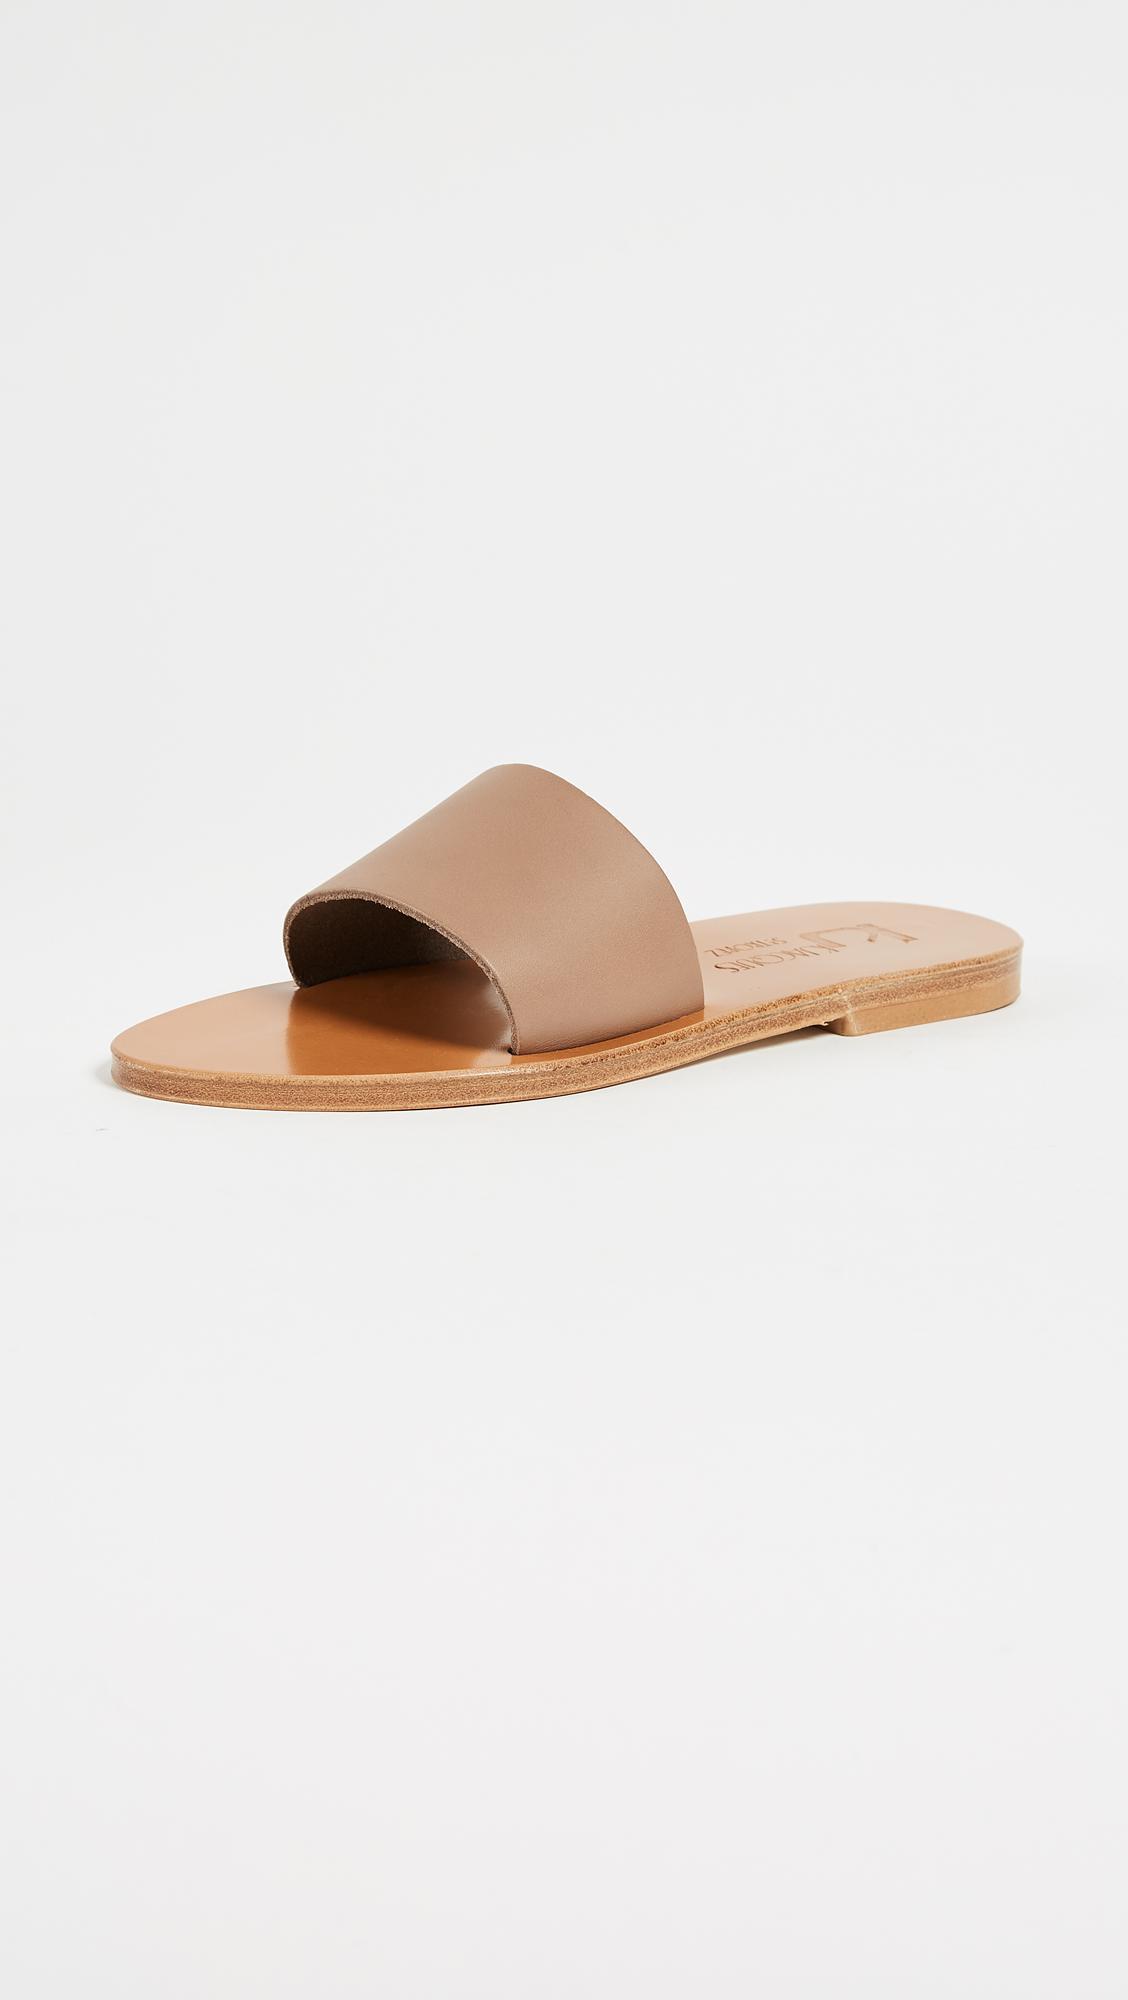 Arezzo Sandals in Metallics,Black K.Jacques